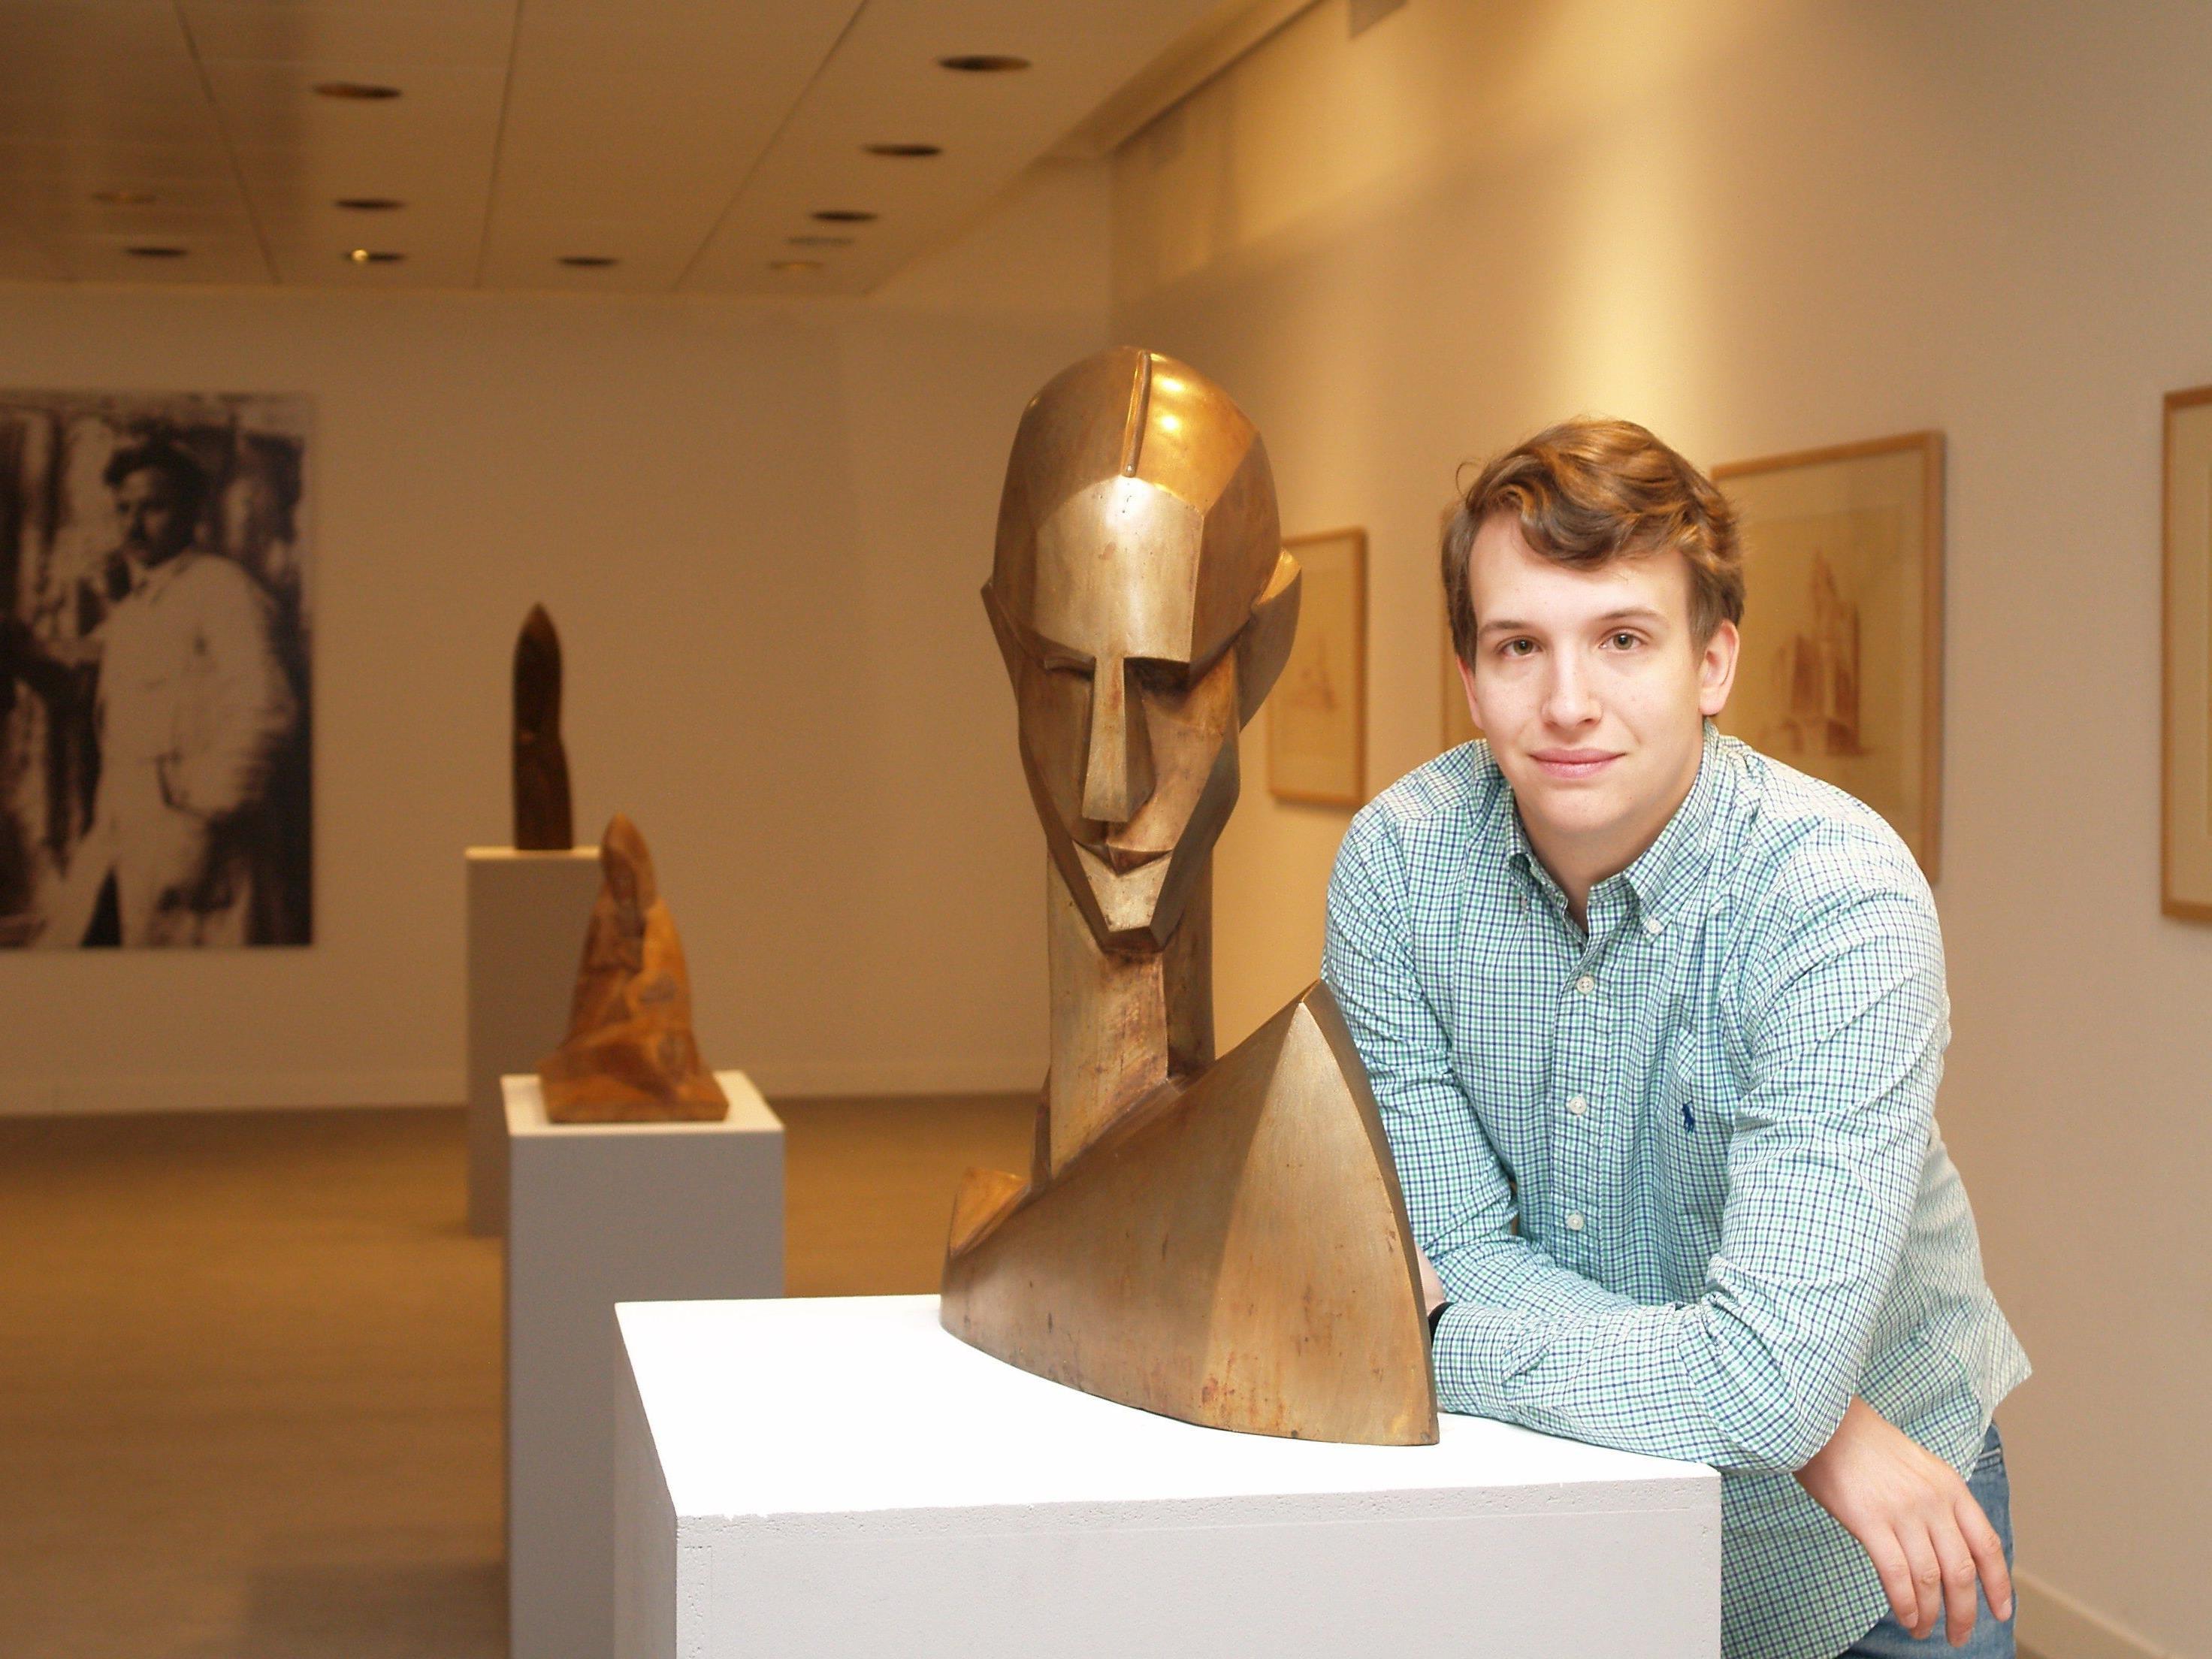 Junggalerist Maximilian Hutz präsentiert  Arbeiten des bekannten Bildhaueres Albert Bechtold.